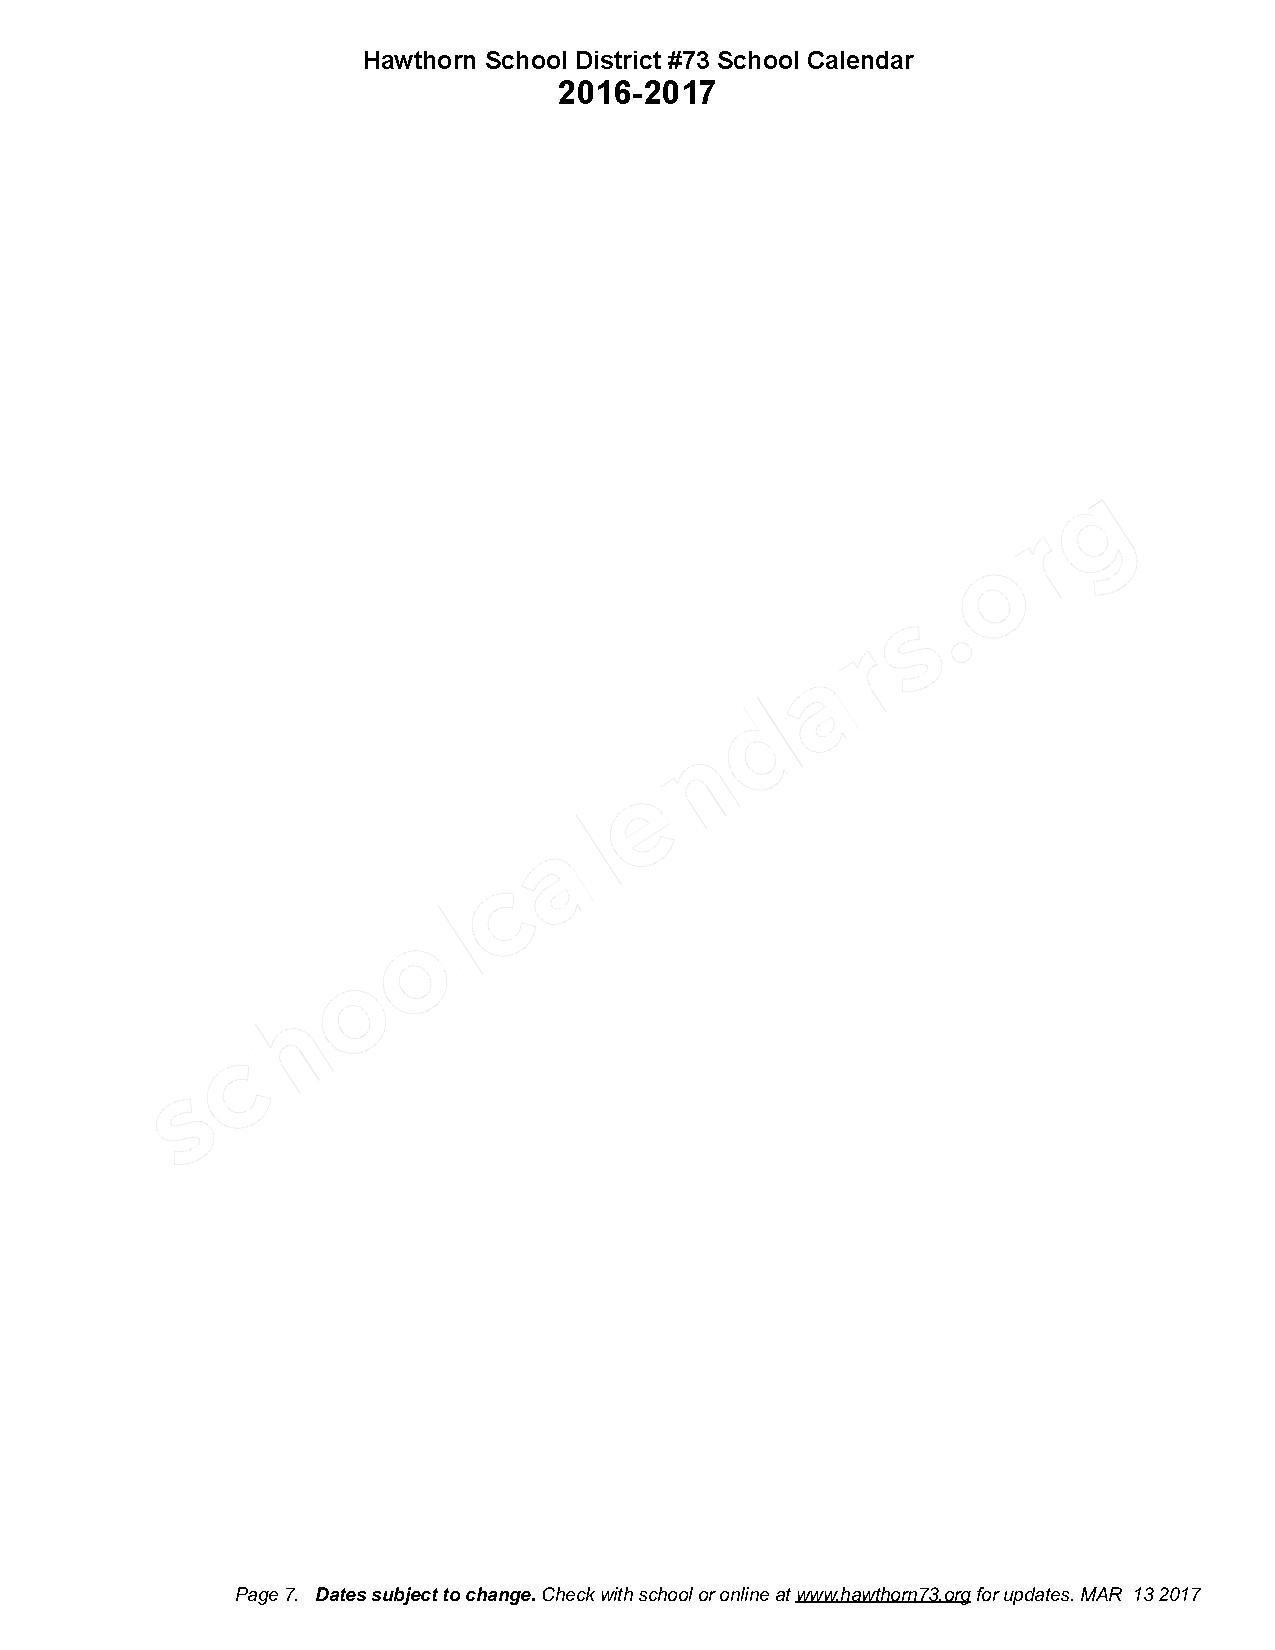 2016 - 2017 District Calendar – Hawthorn Aspen Elementary School – page 7